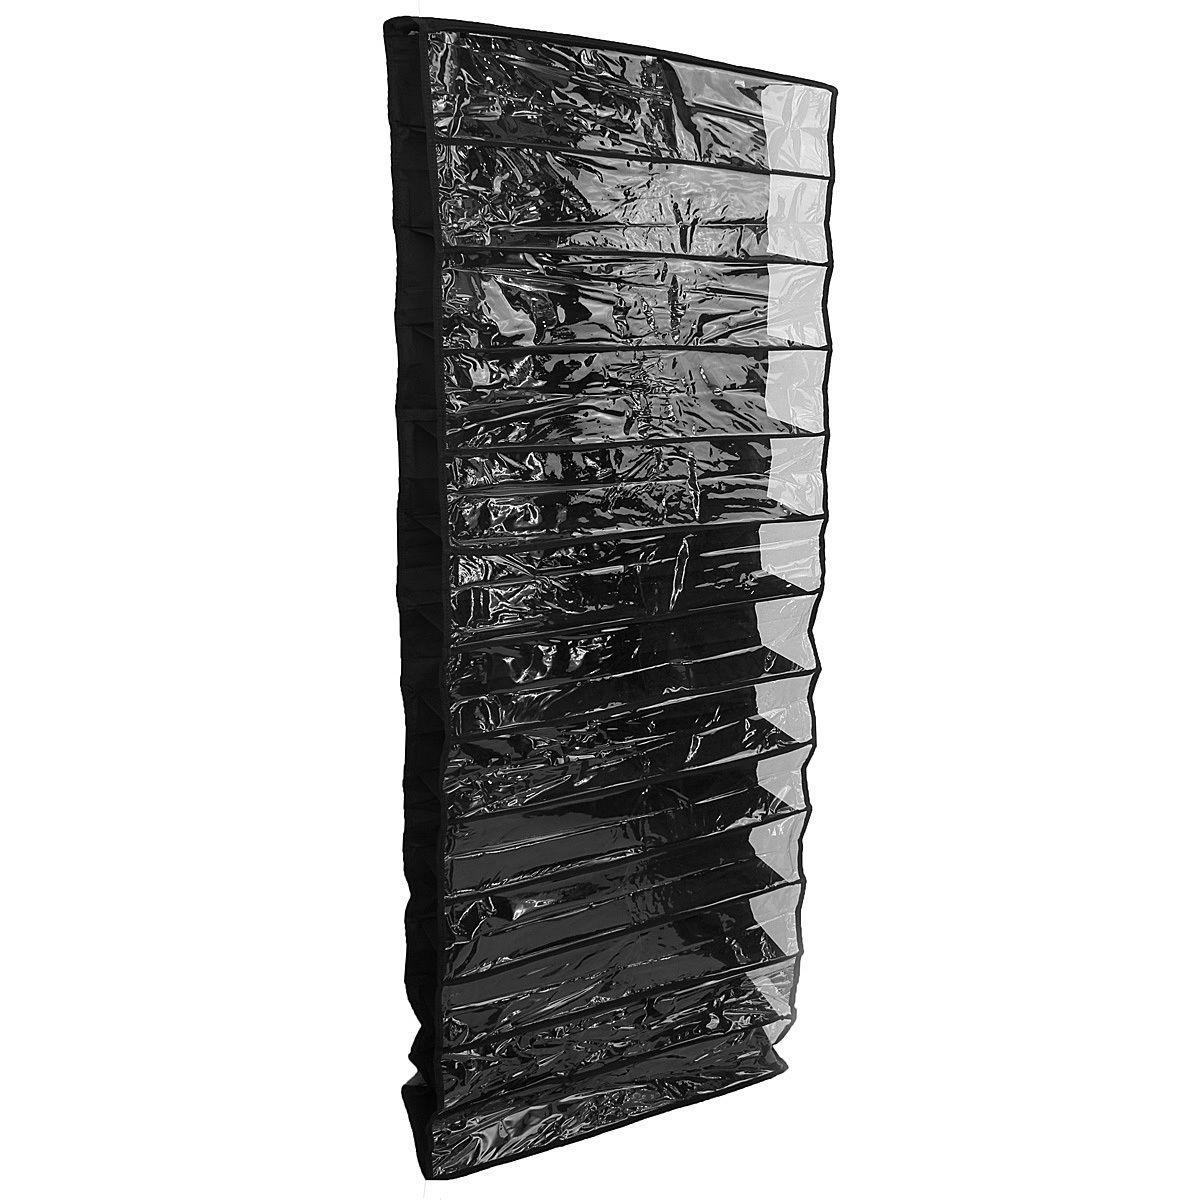 26 Pairs Over Door Hanging Stand Shoe Rack Shelf Storage Organiser Pocket Holder black26 Pairs Over Door Hanging Stand Shoe Rack Shelf Storage Organiser Pocket Holder black